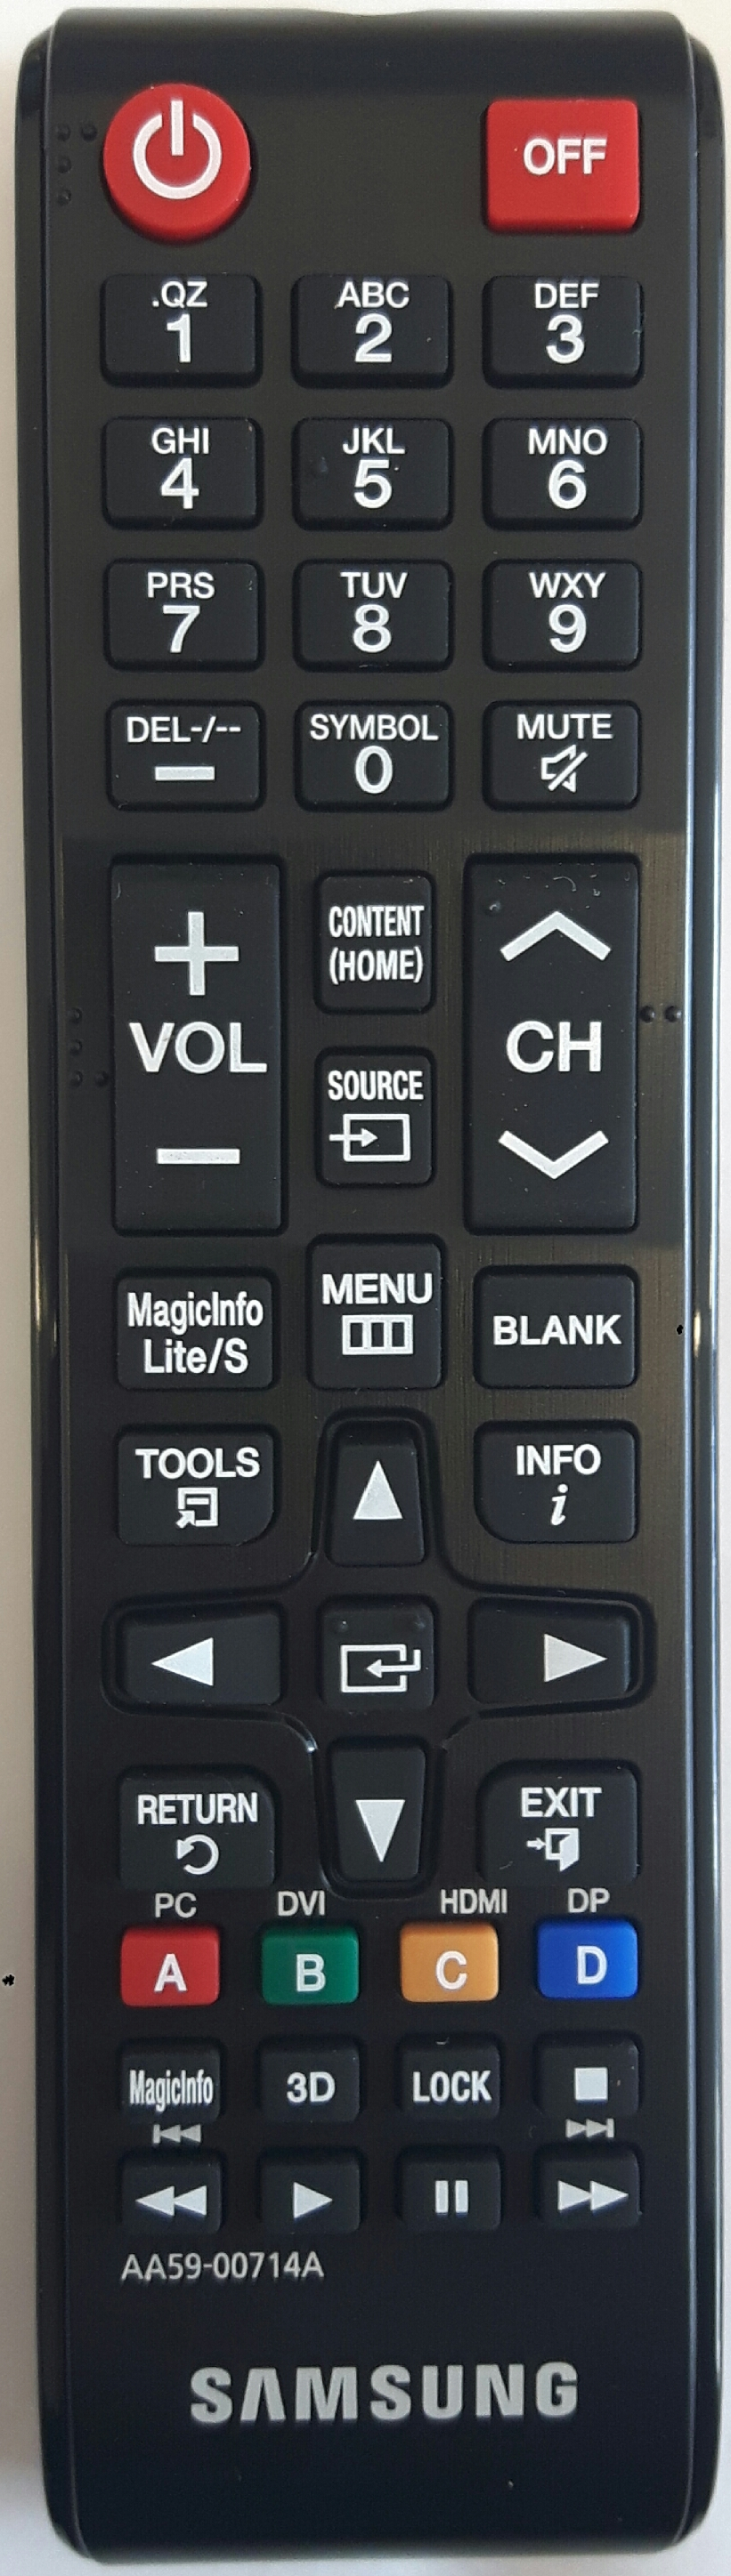 SAMSUNG AA59-00714A Remote Control Original